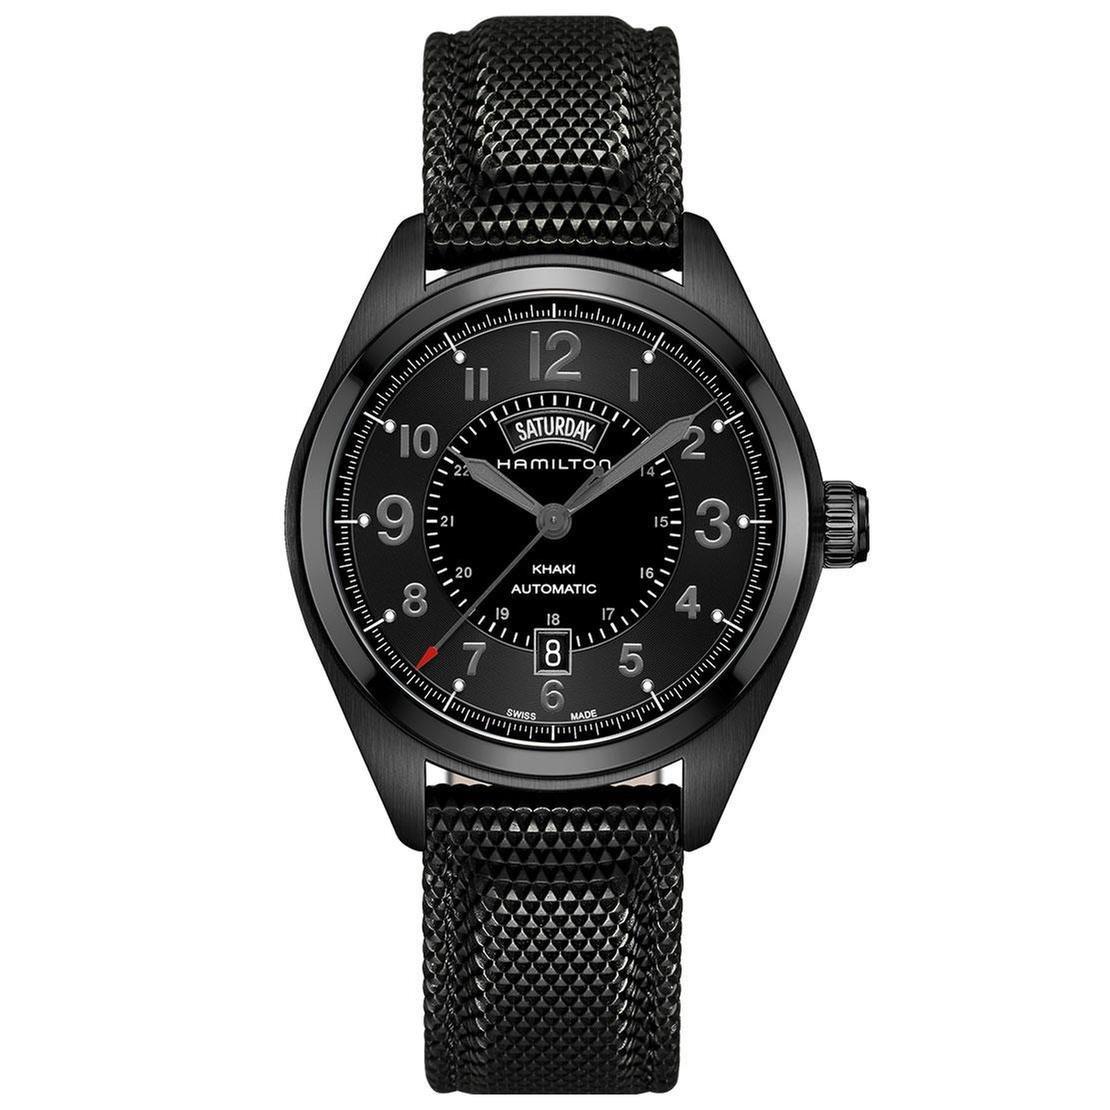 b78b1e34f Amazon.com: Hamilton Men's H70695735 Khaki Field Day Date Black Automatic  Watch: Watches